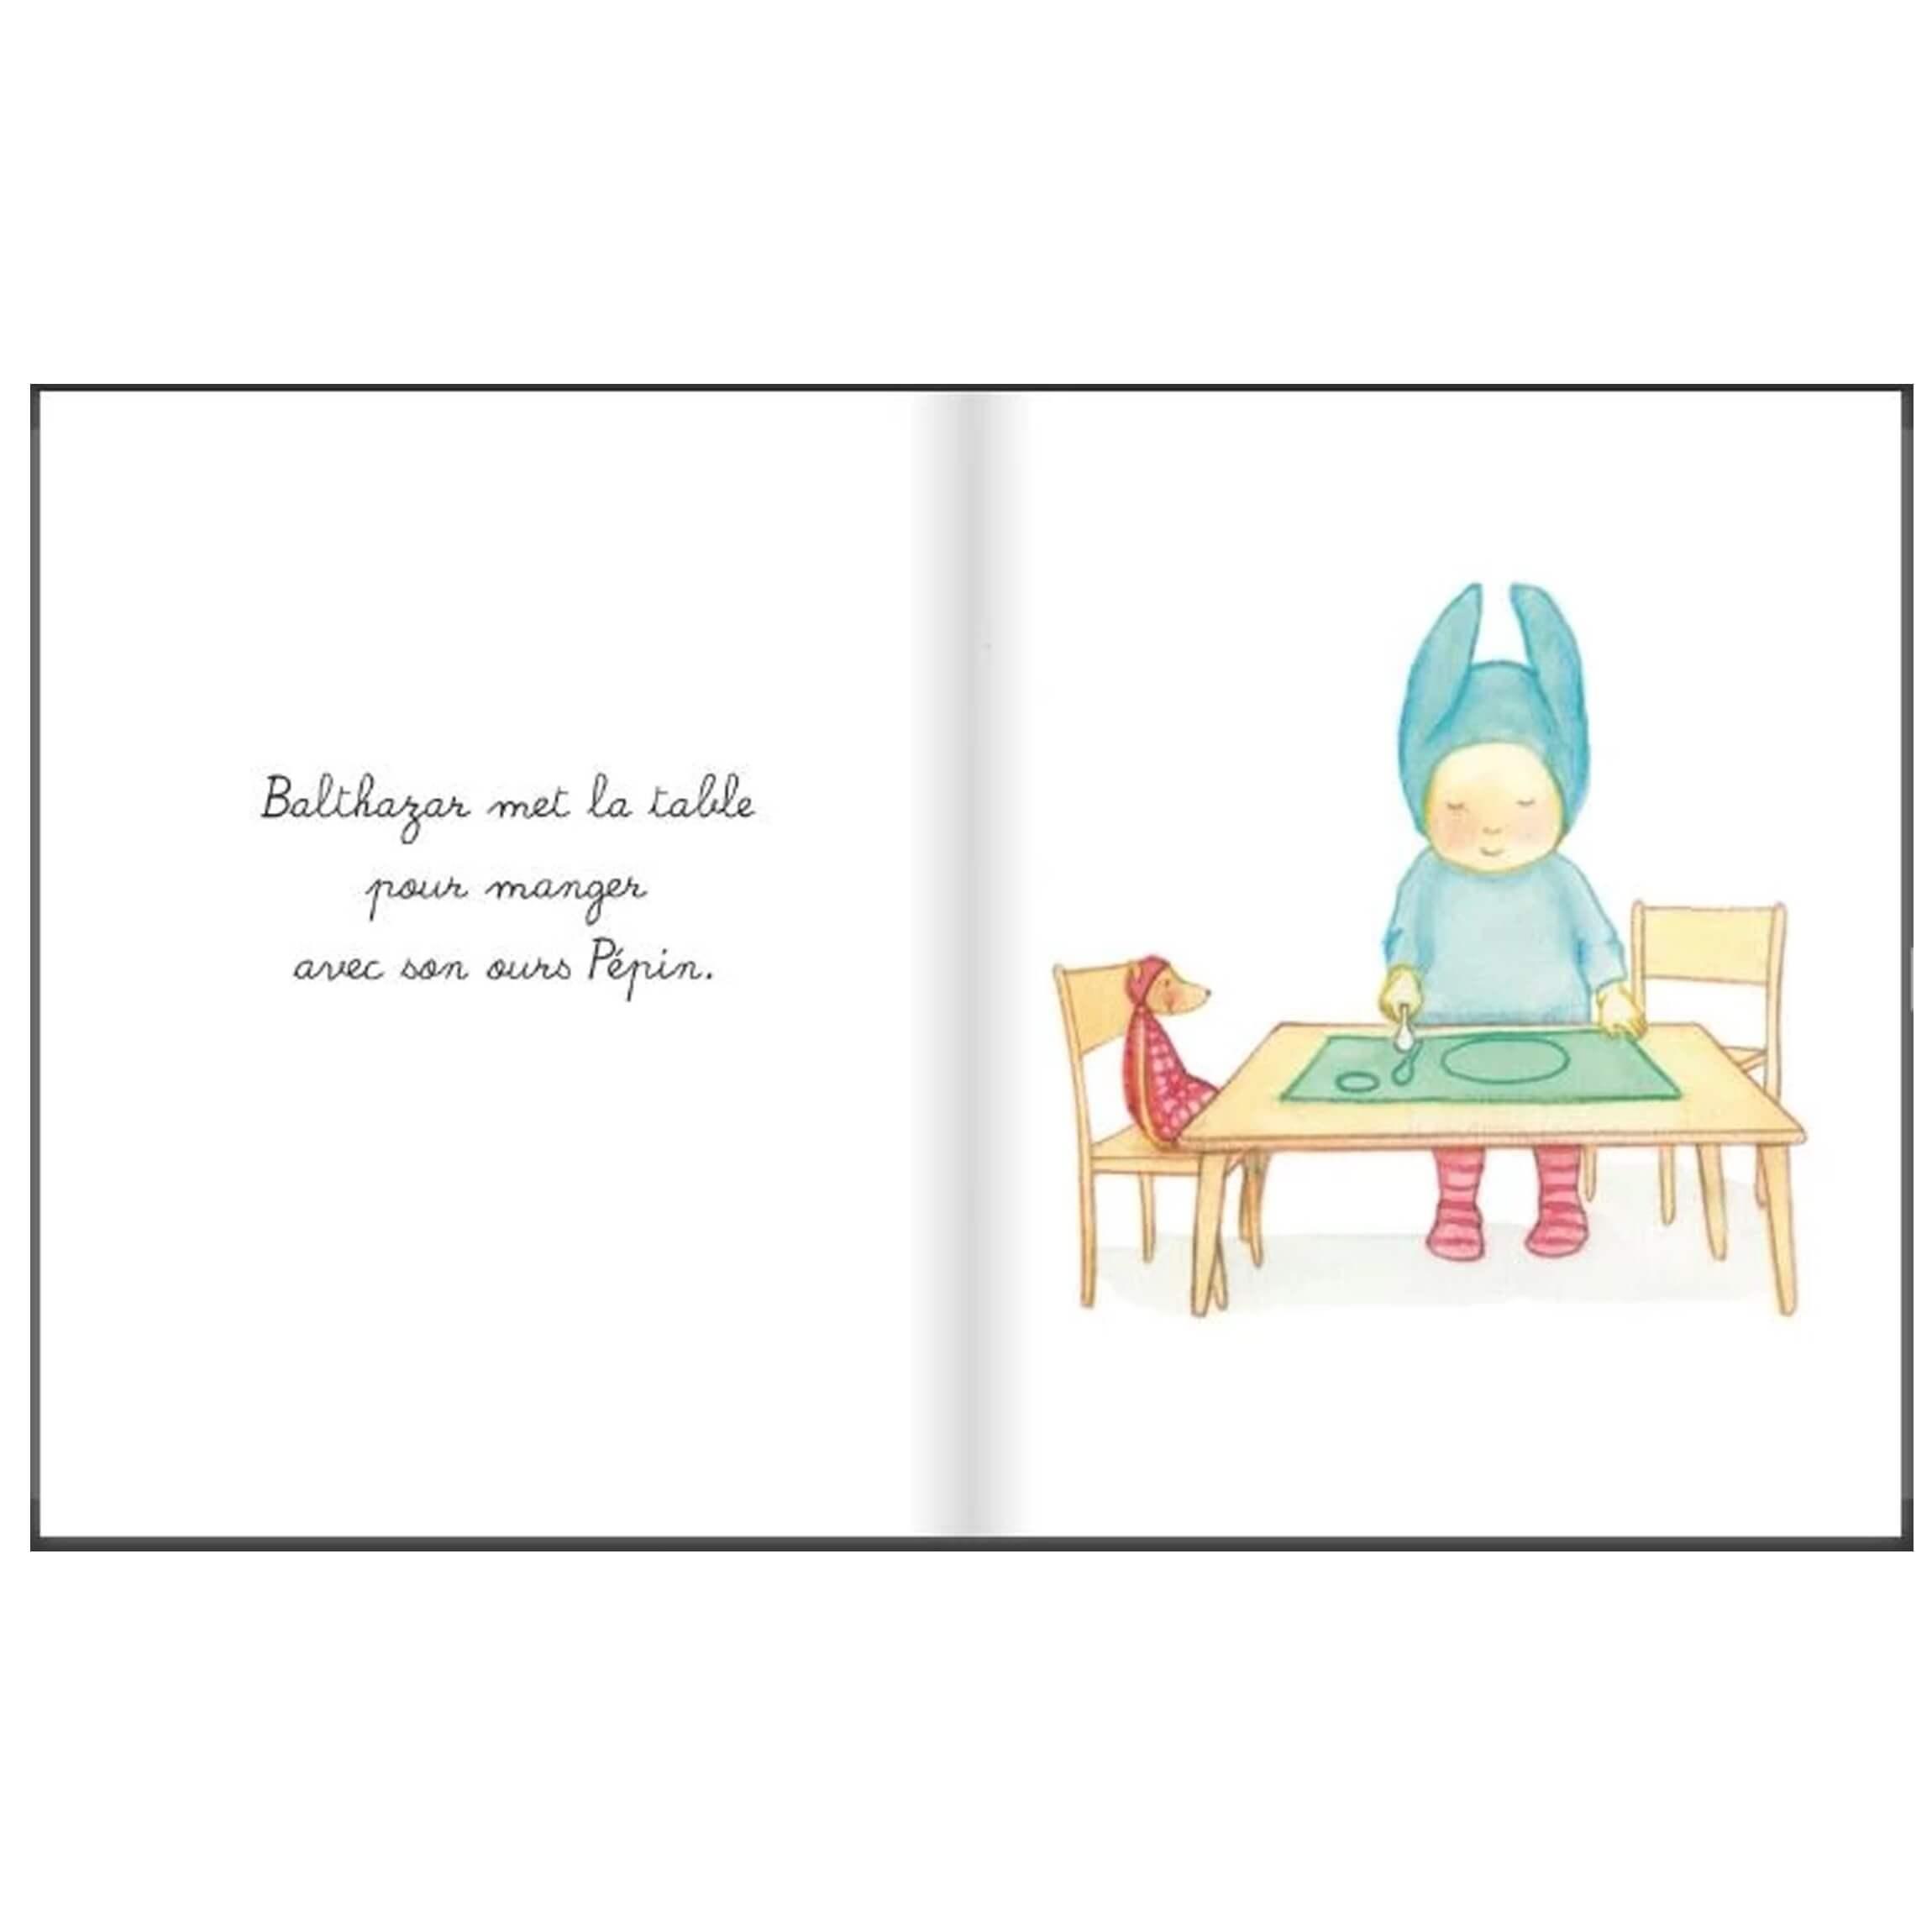 Livre Bébé Balthazar - A Table